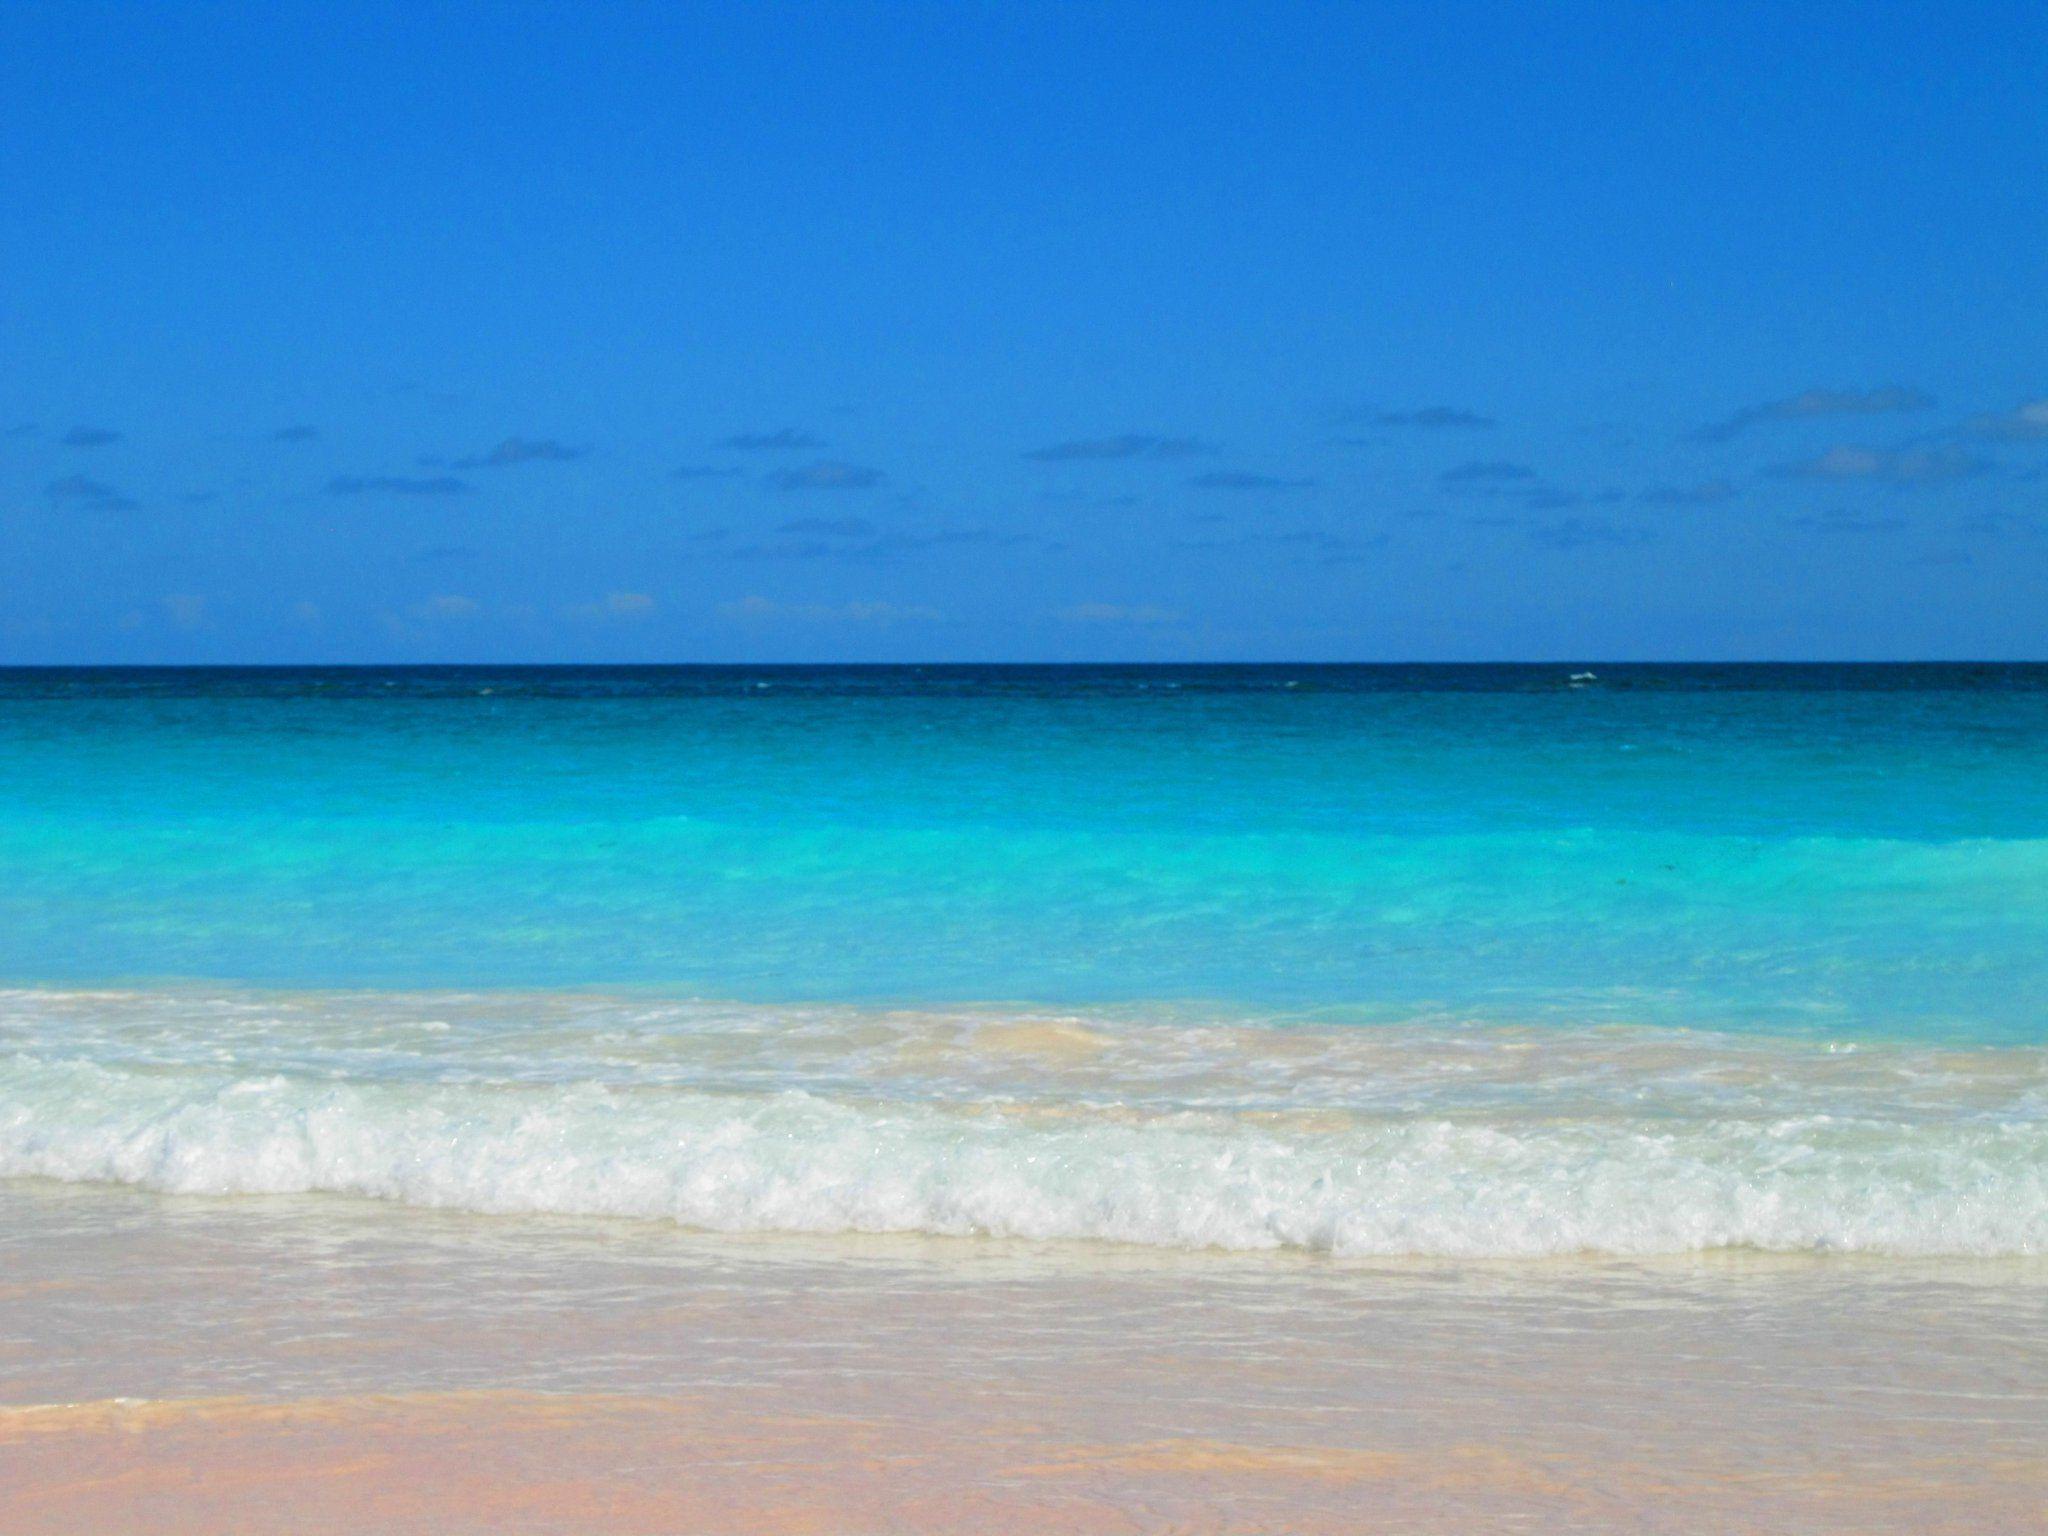 10 praias de tirar o fôlego http://bit.ly/2gCOLdo via @TripAdvisor http://bit.ly/2fw8dwG